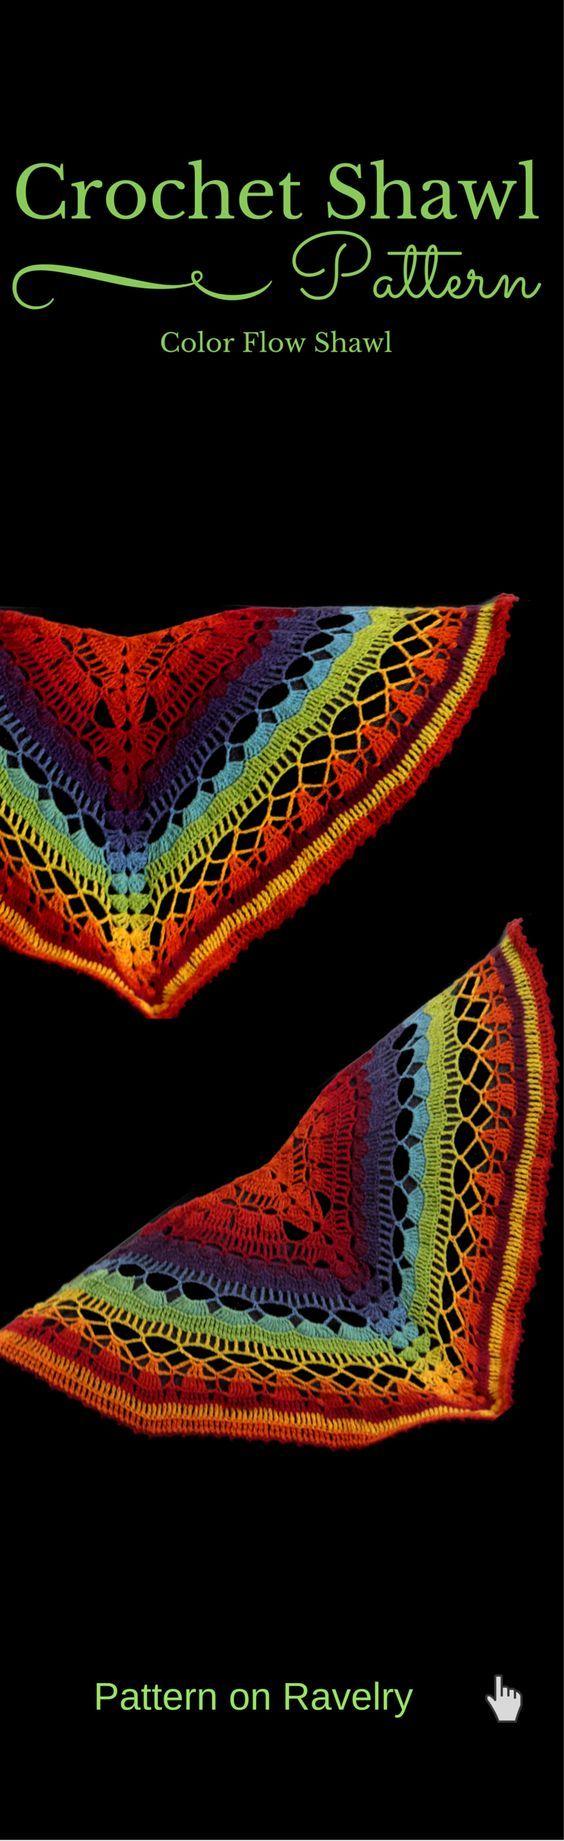 Color Flow Shawl pattern by Elena Madsen | Chal, Blusas de tejido y ...